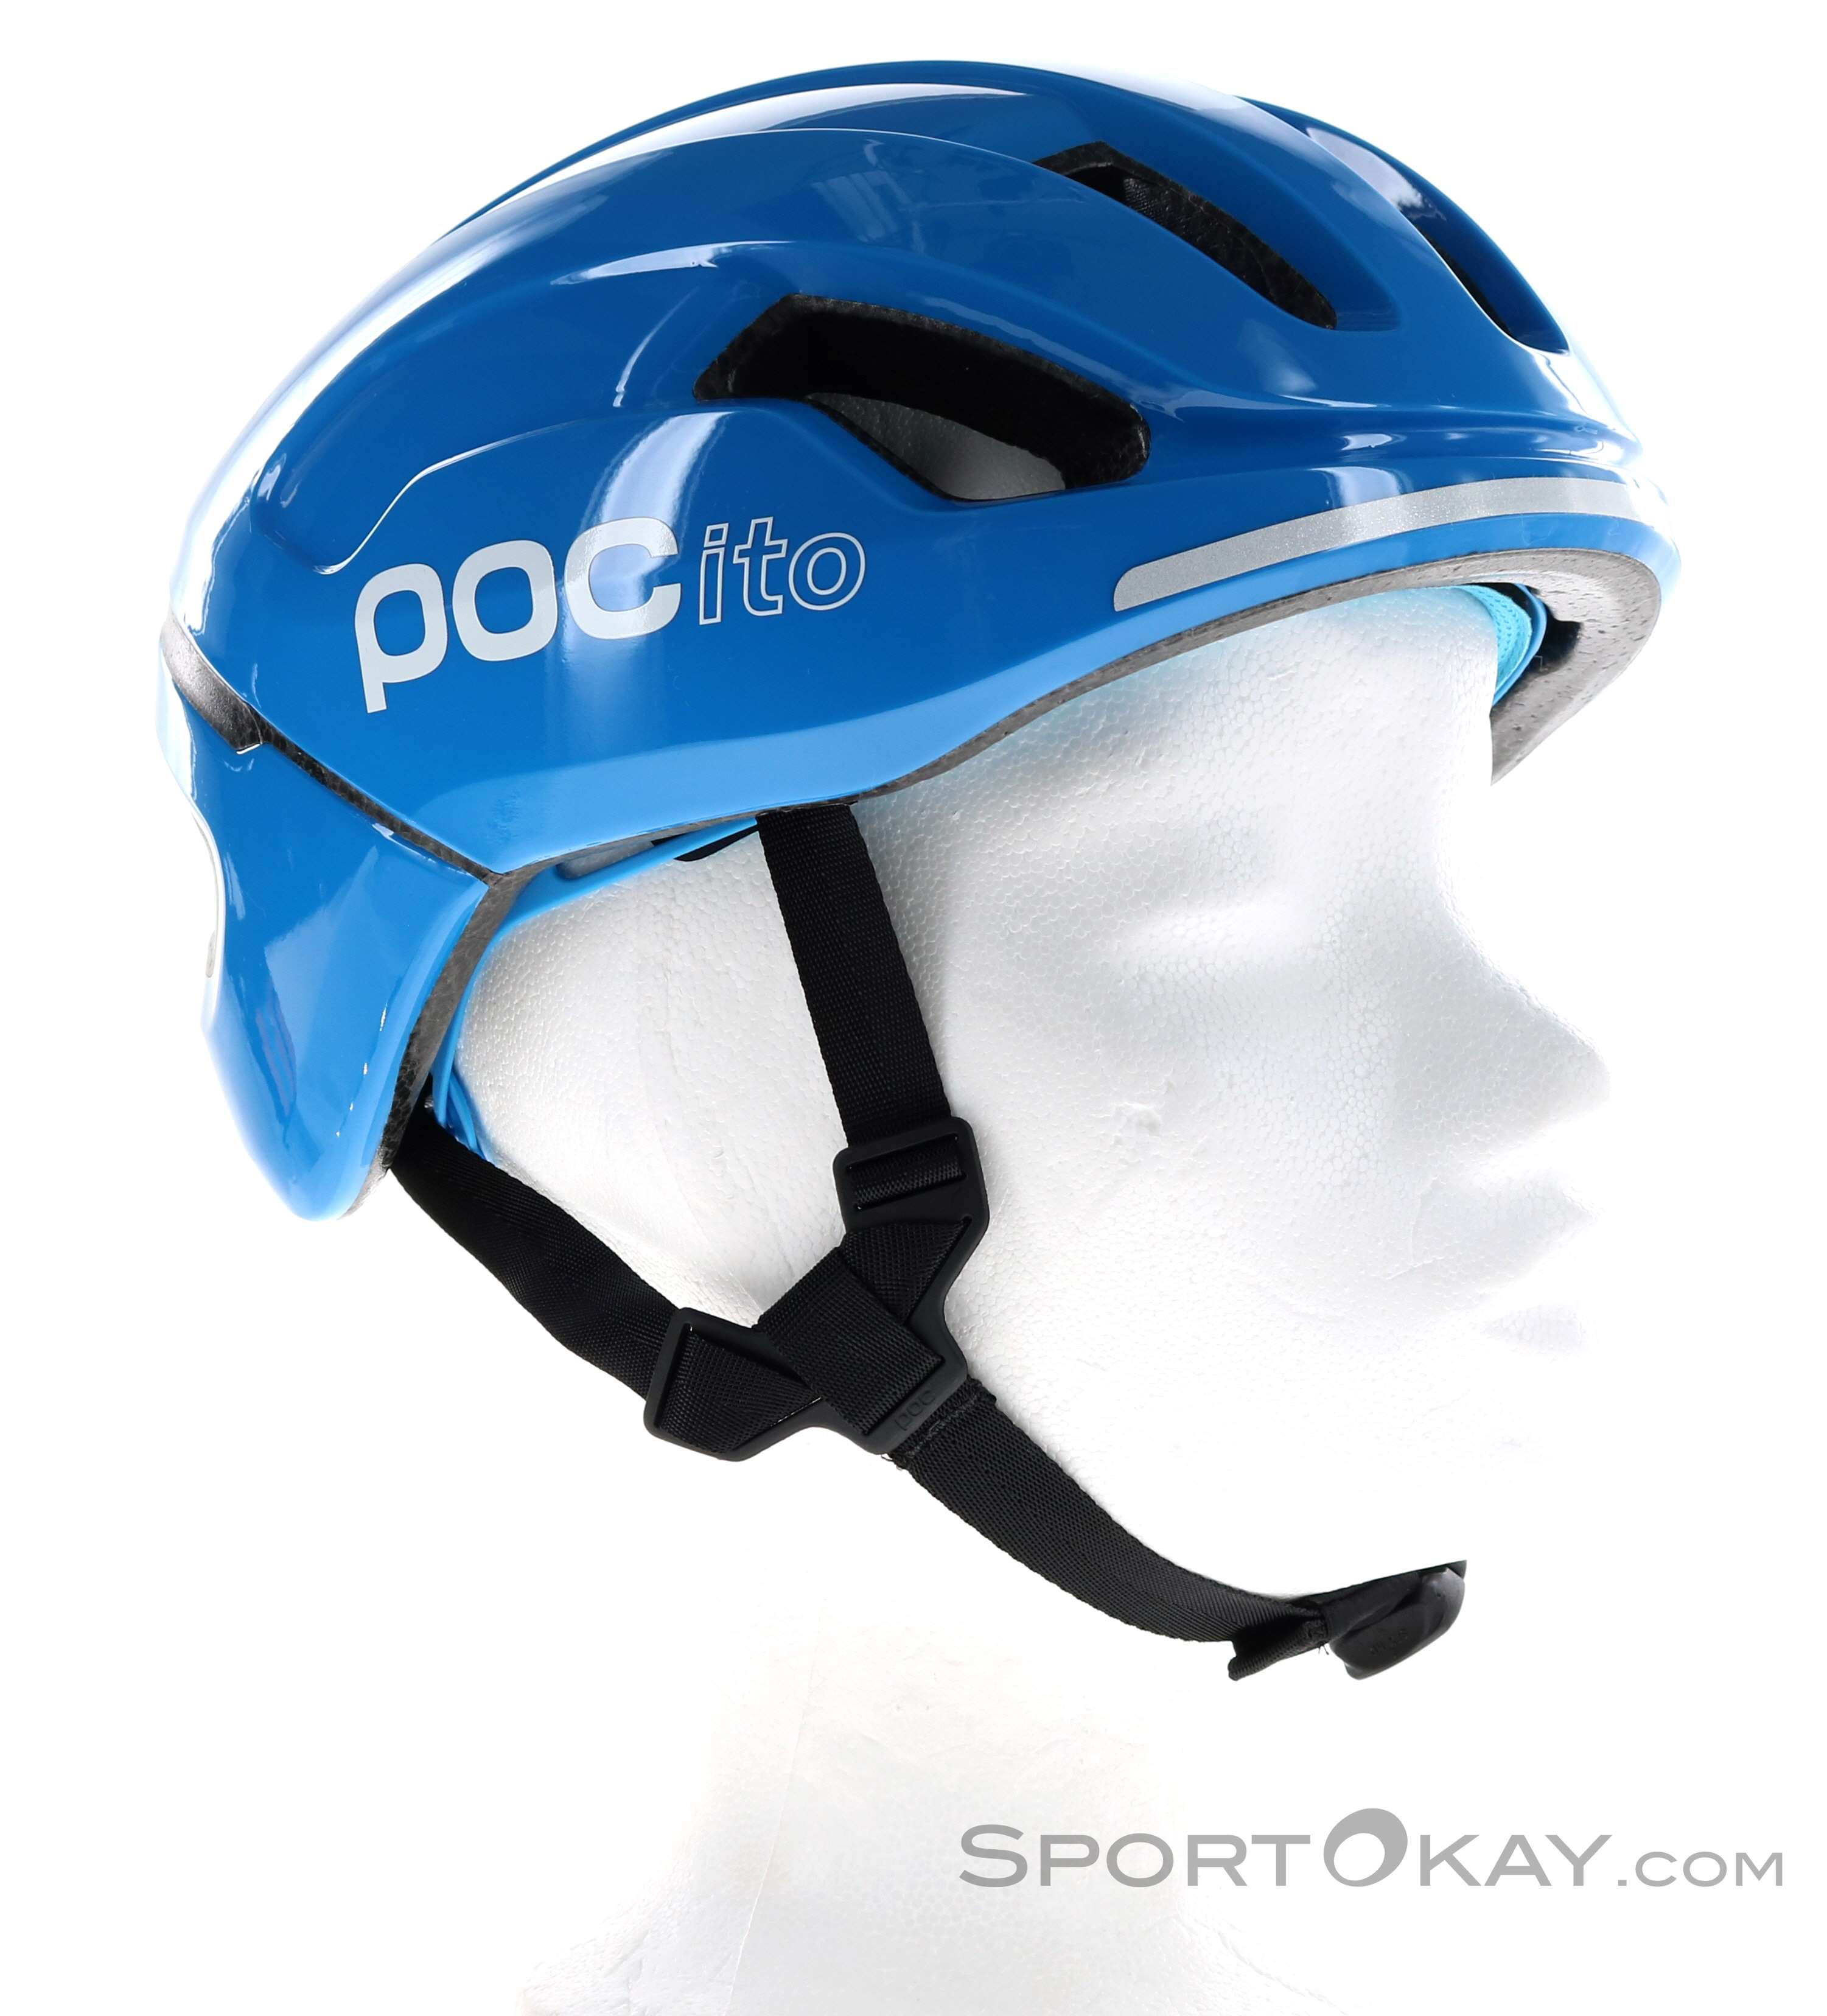 POCito Omne SPIN Road Bike Helmet